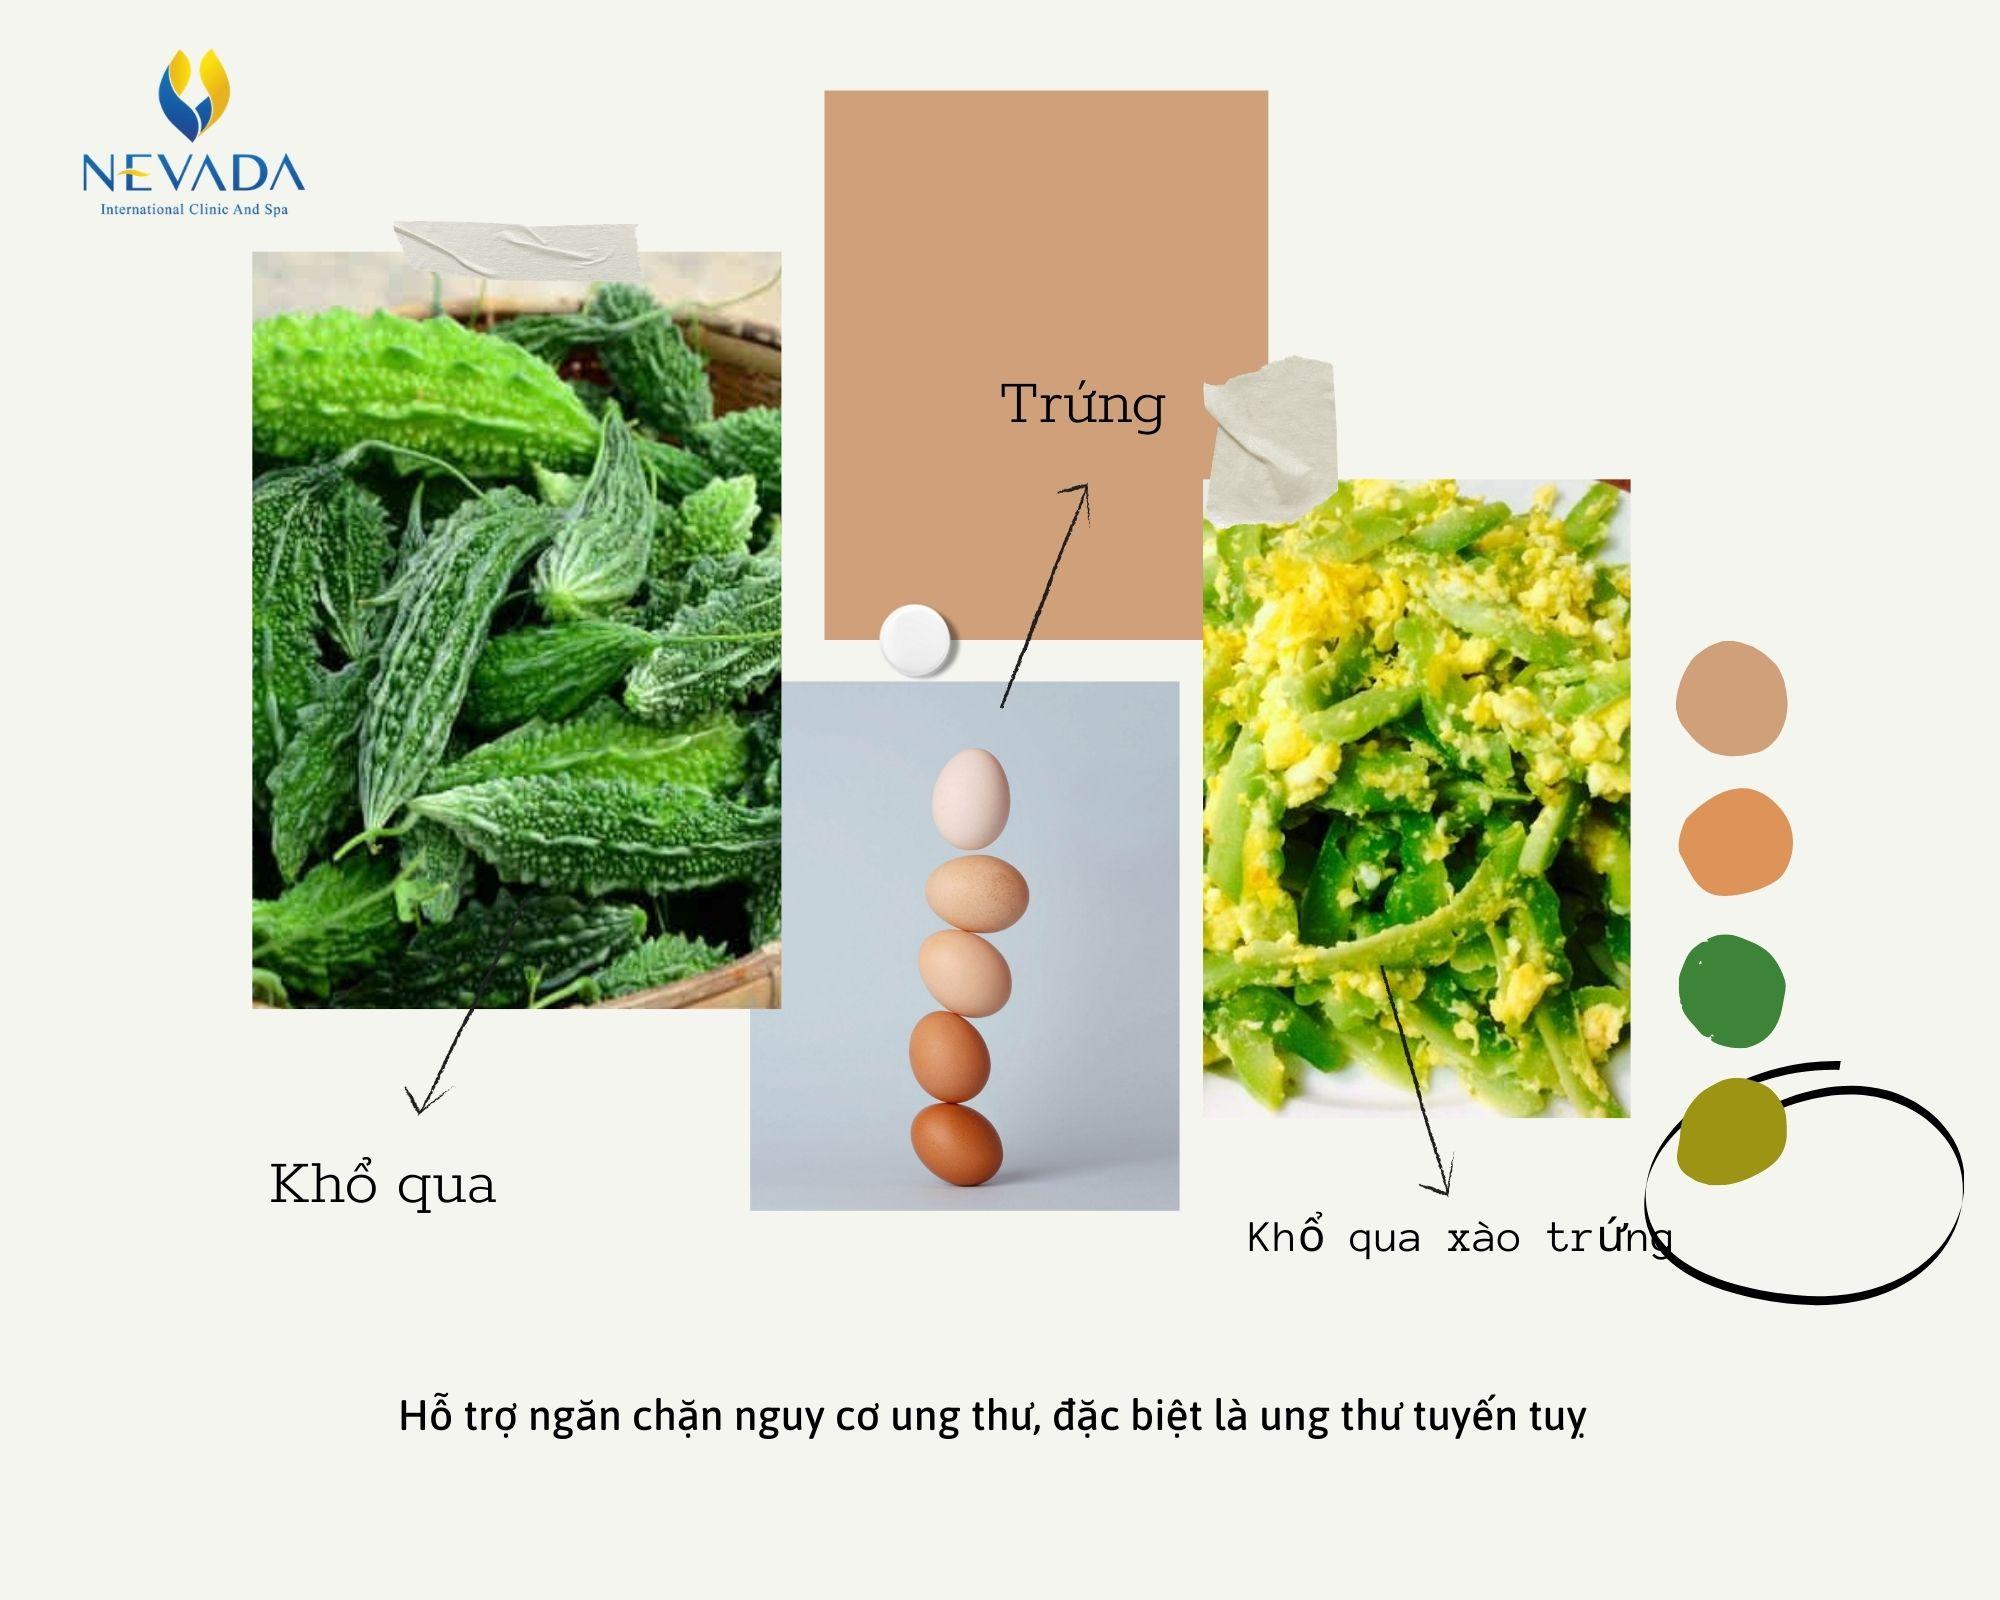 khổ qua xào trứng giảm cân, khổ qua xào trứng có giảm cân không, mướp đắng xào trứng giảm cân, mướp đắng xào trứng có giảm cân, mướp đắng xào trứng có béo không, mướp đắng xào trứng bao nhiêu calo, khổ qua xào trứng bao nhiêu calo, calo trong mướp đắng xào trứng